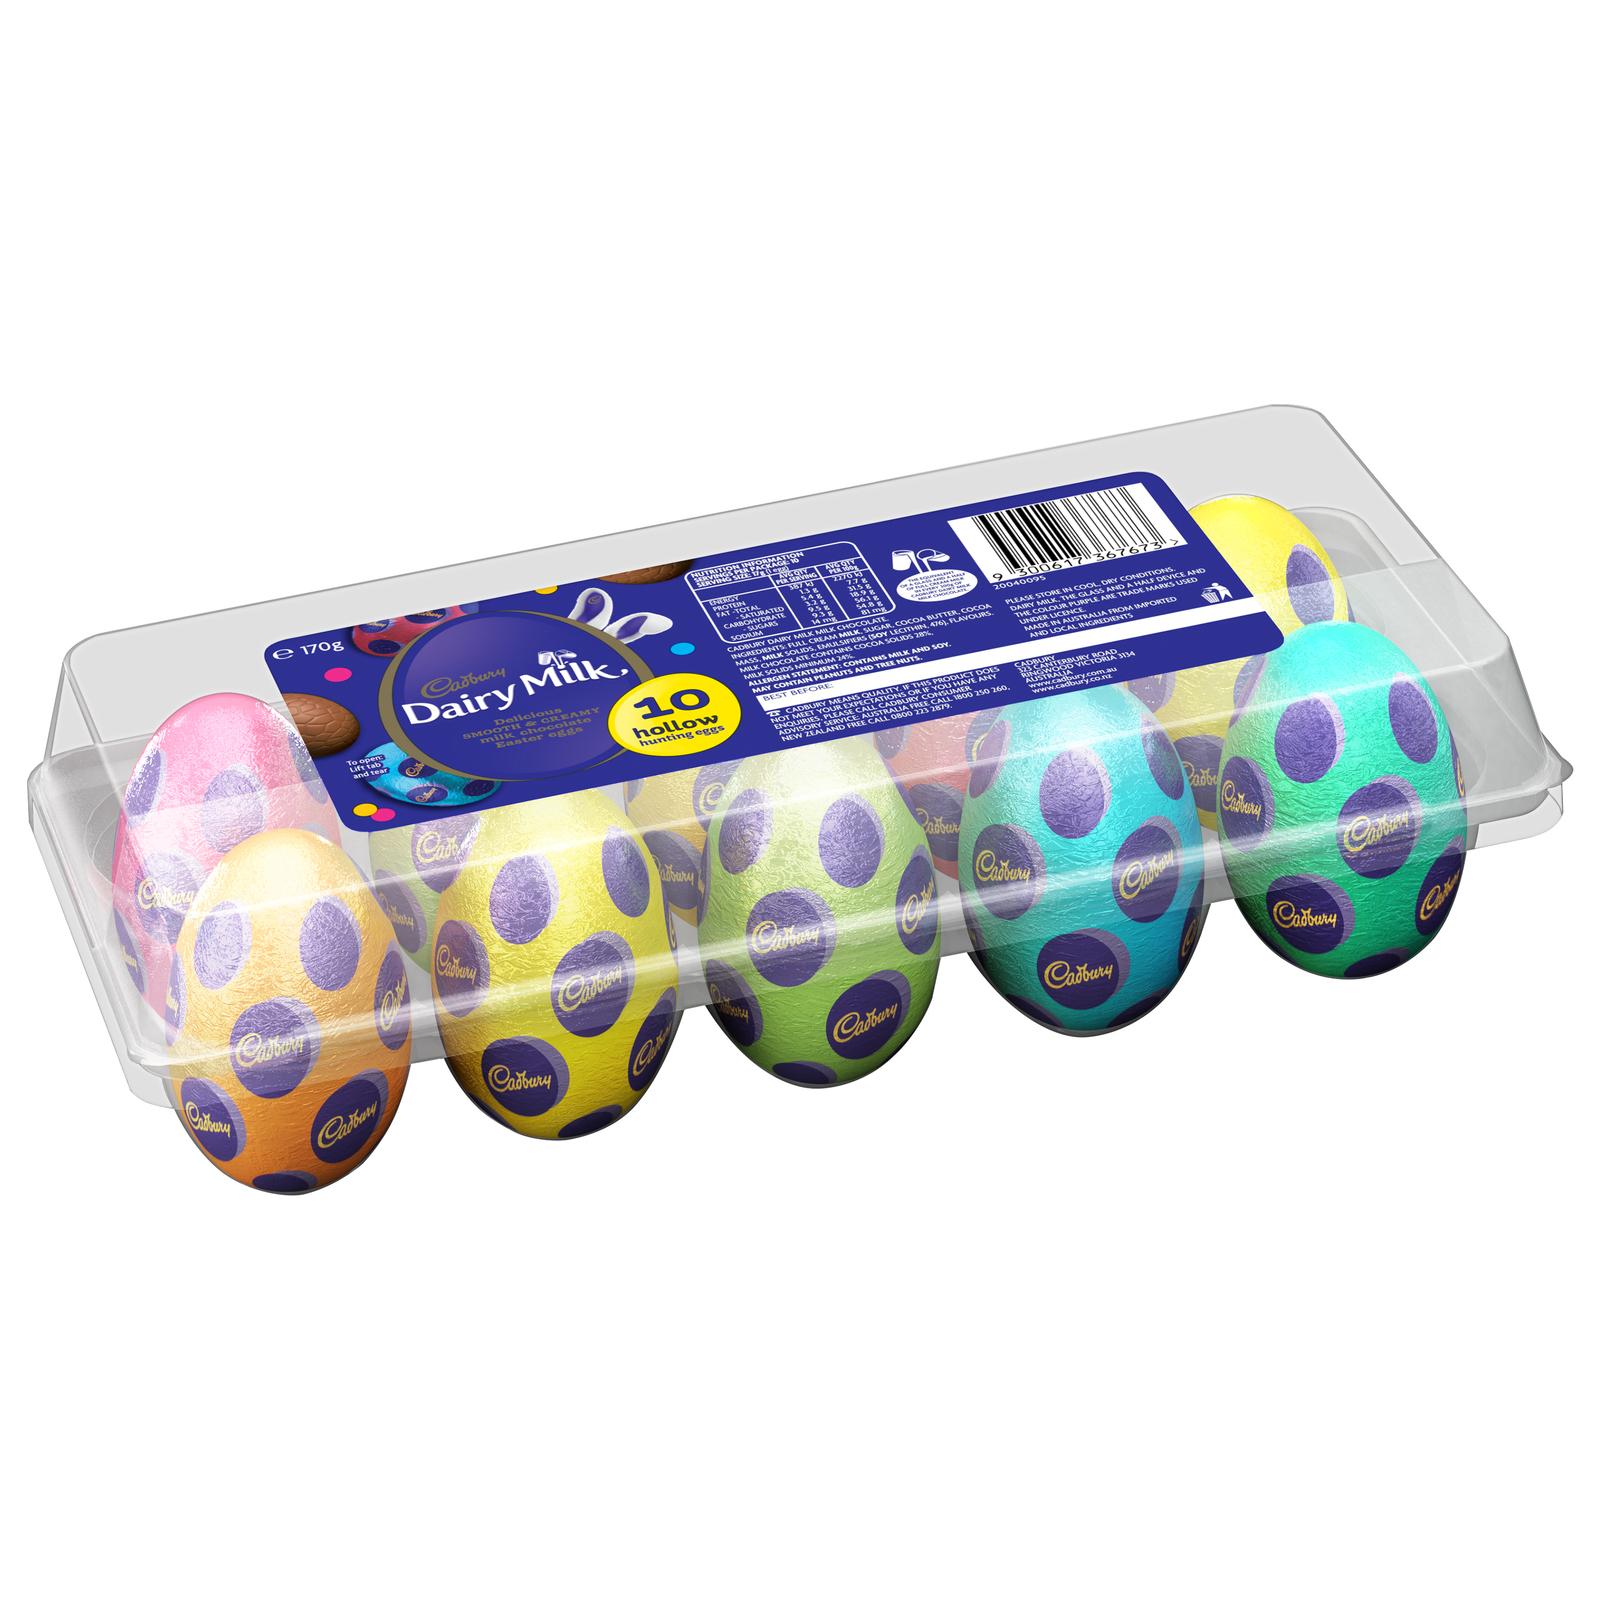 Cadbury Egg Crate 170g (10 Pack) image